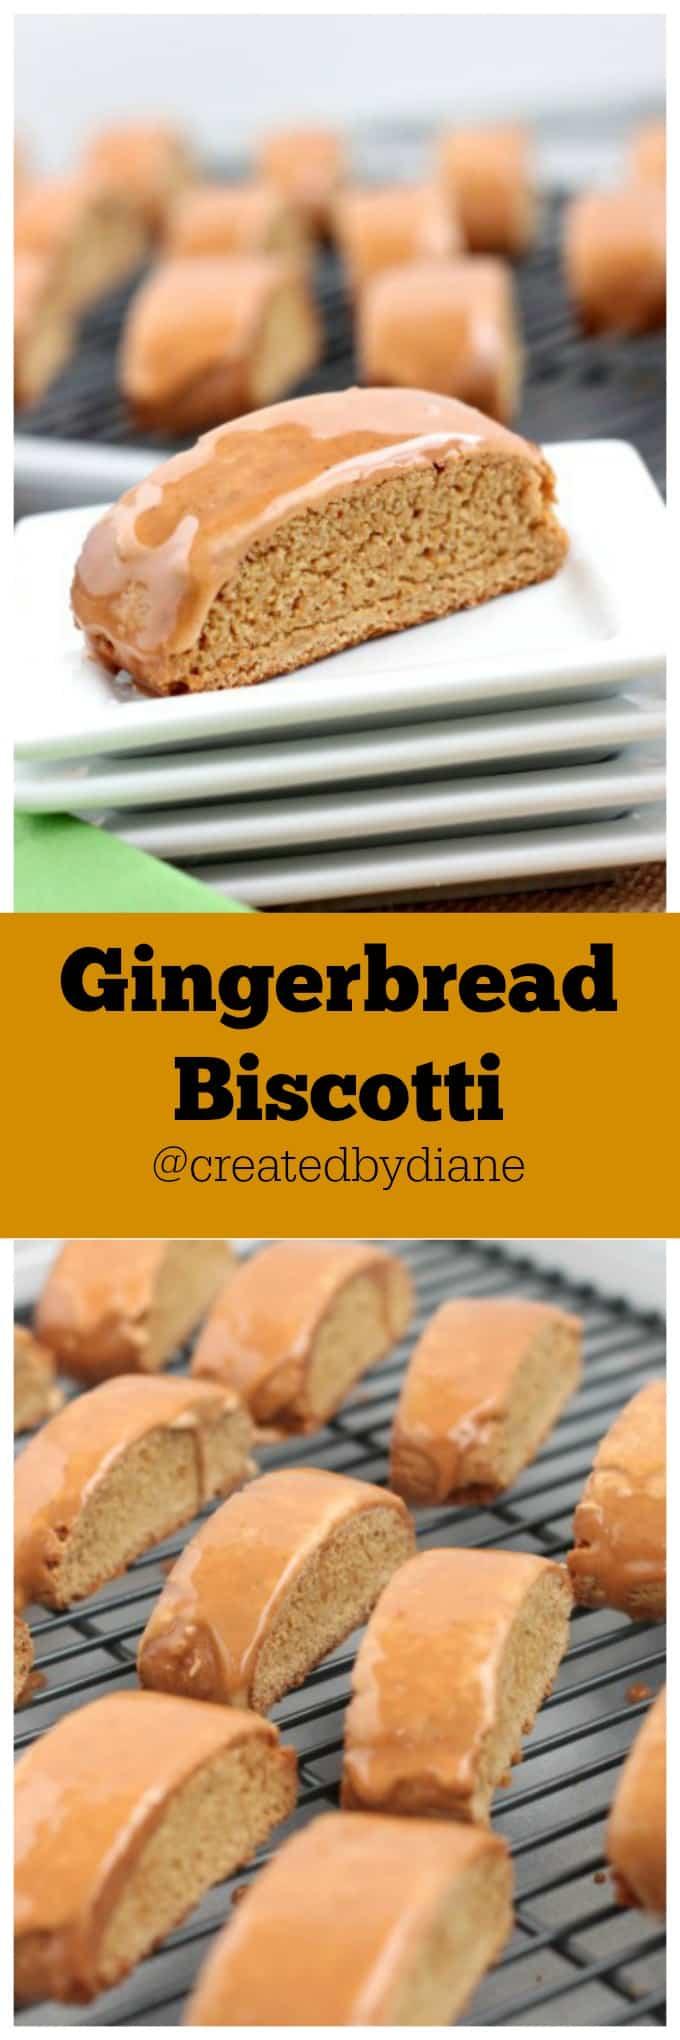 Gingerbread biscotti @createdbydiane